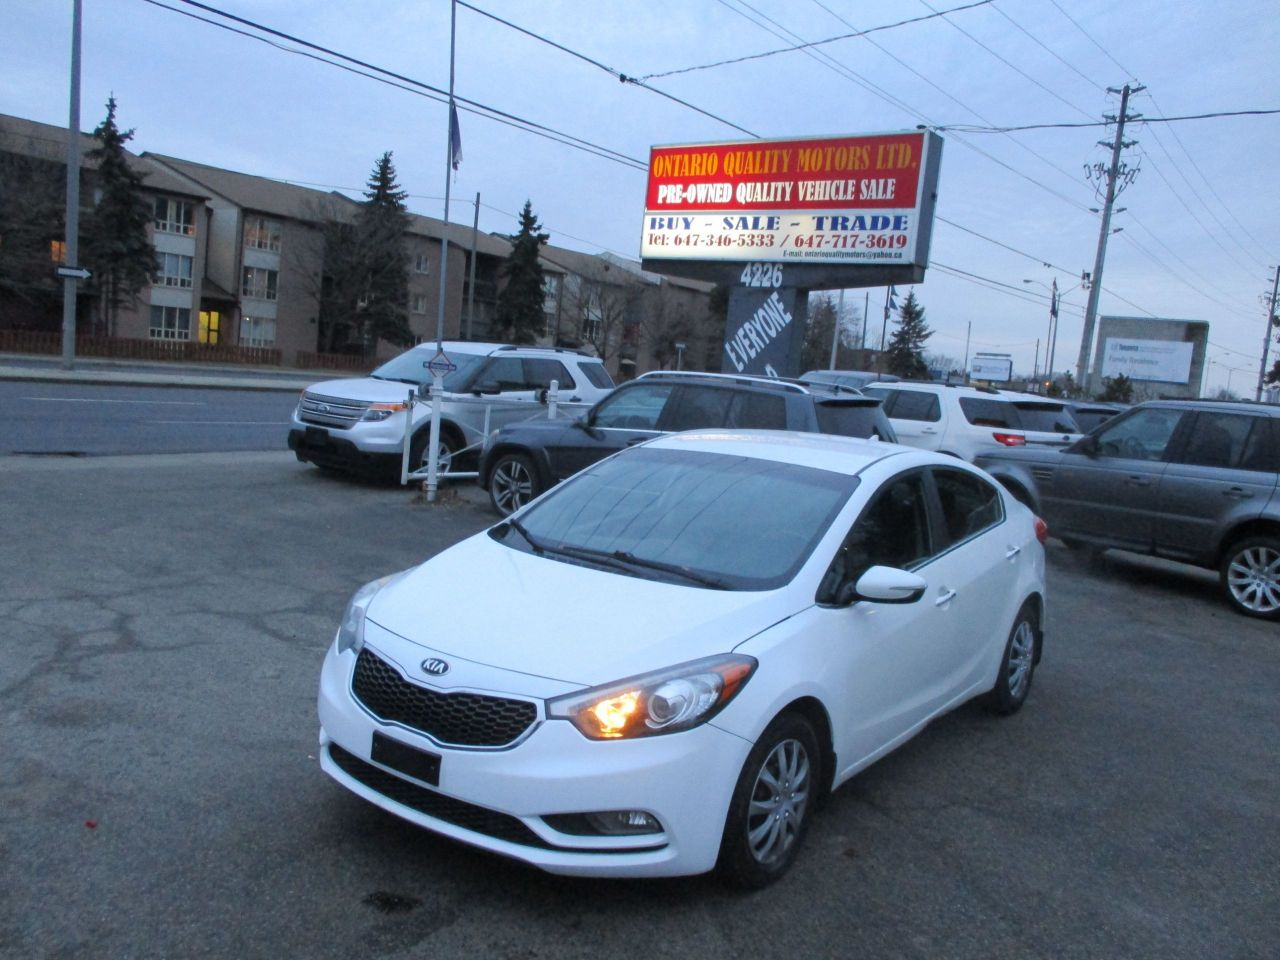 Ontario Quality Motors >> 2014 Kia Forte Ontario Quality Motors Ltd